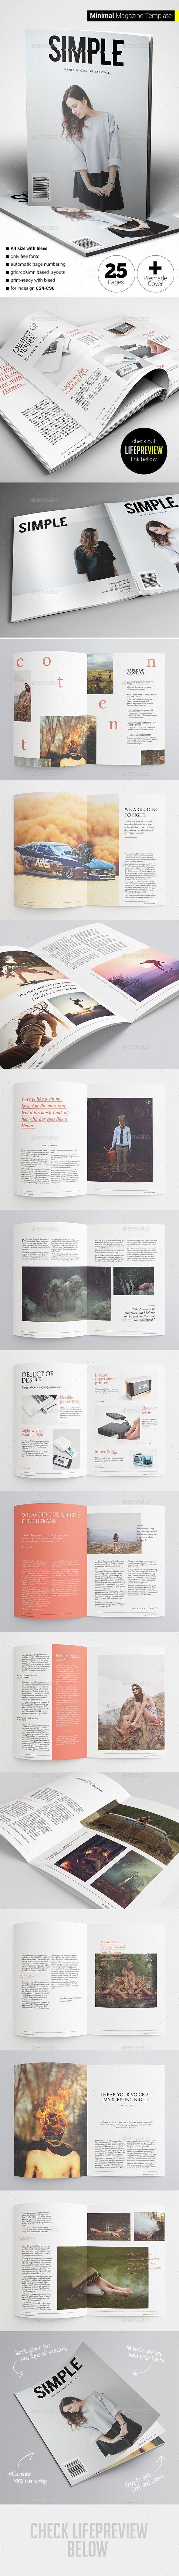 Minimal Magazine Template #design Download: http://graphicriver.net/item/minimal-magazine/12484168?ref=ksioks